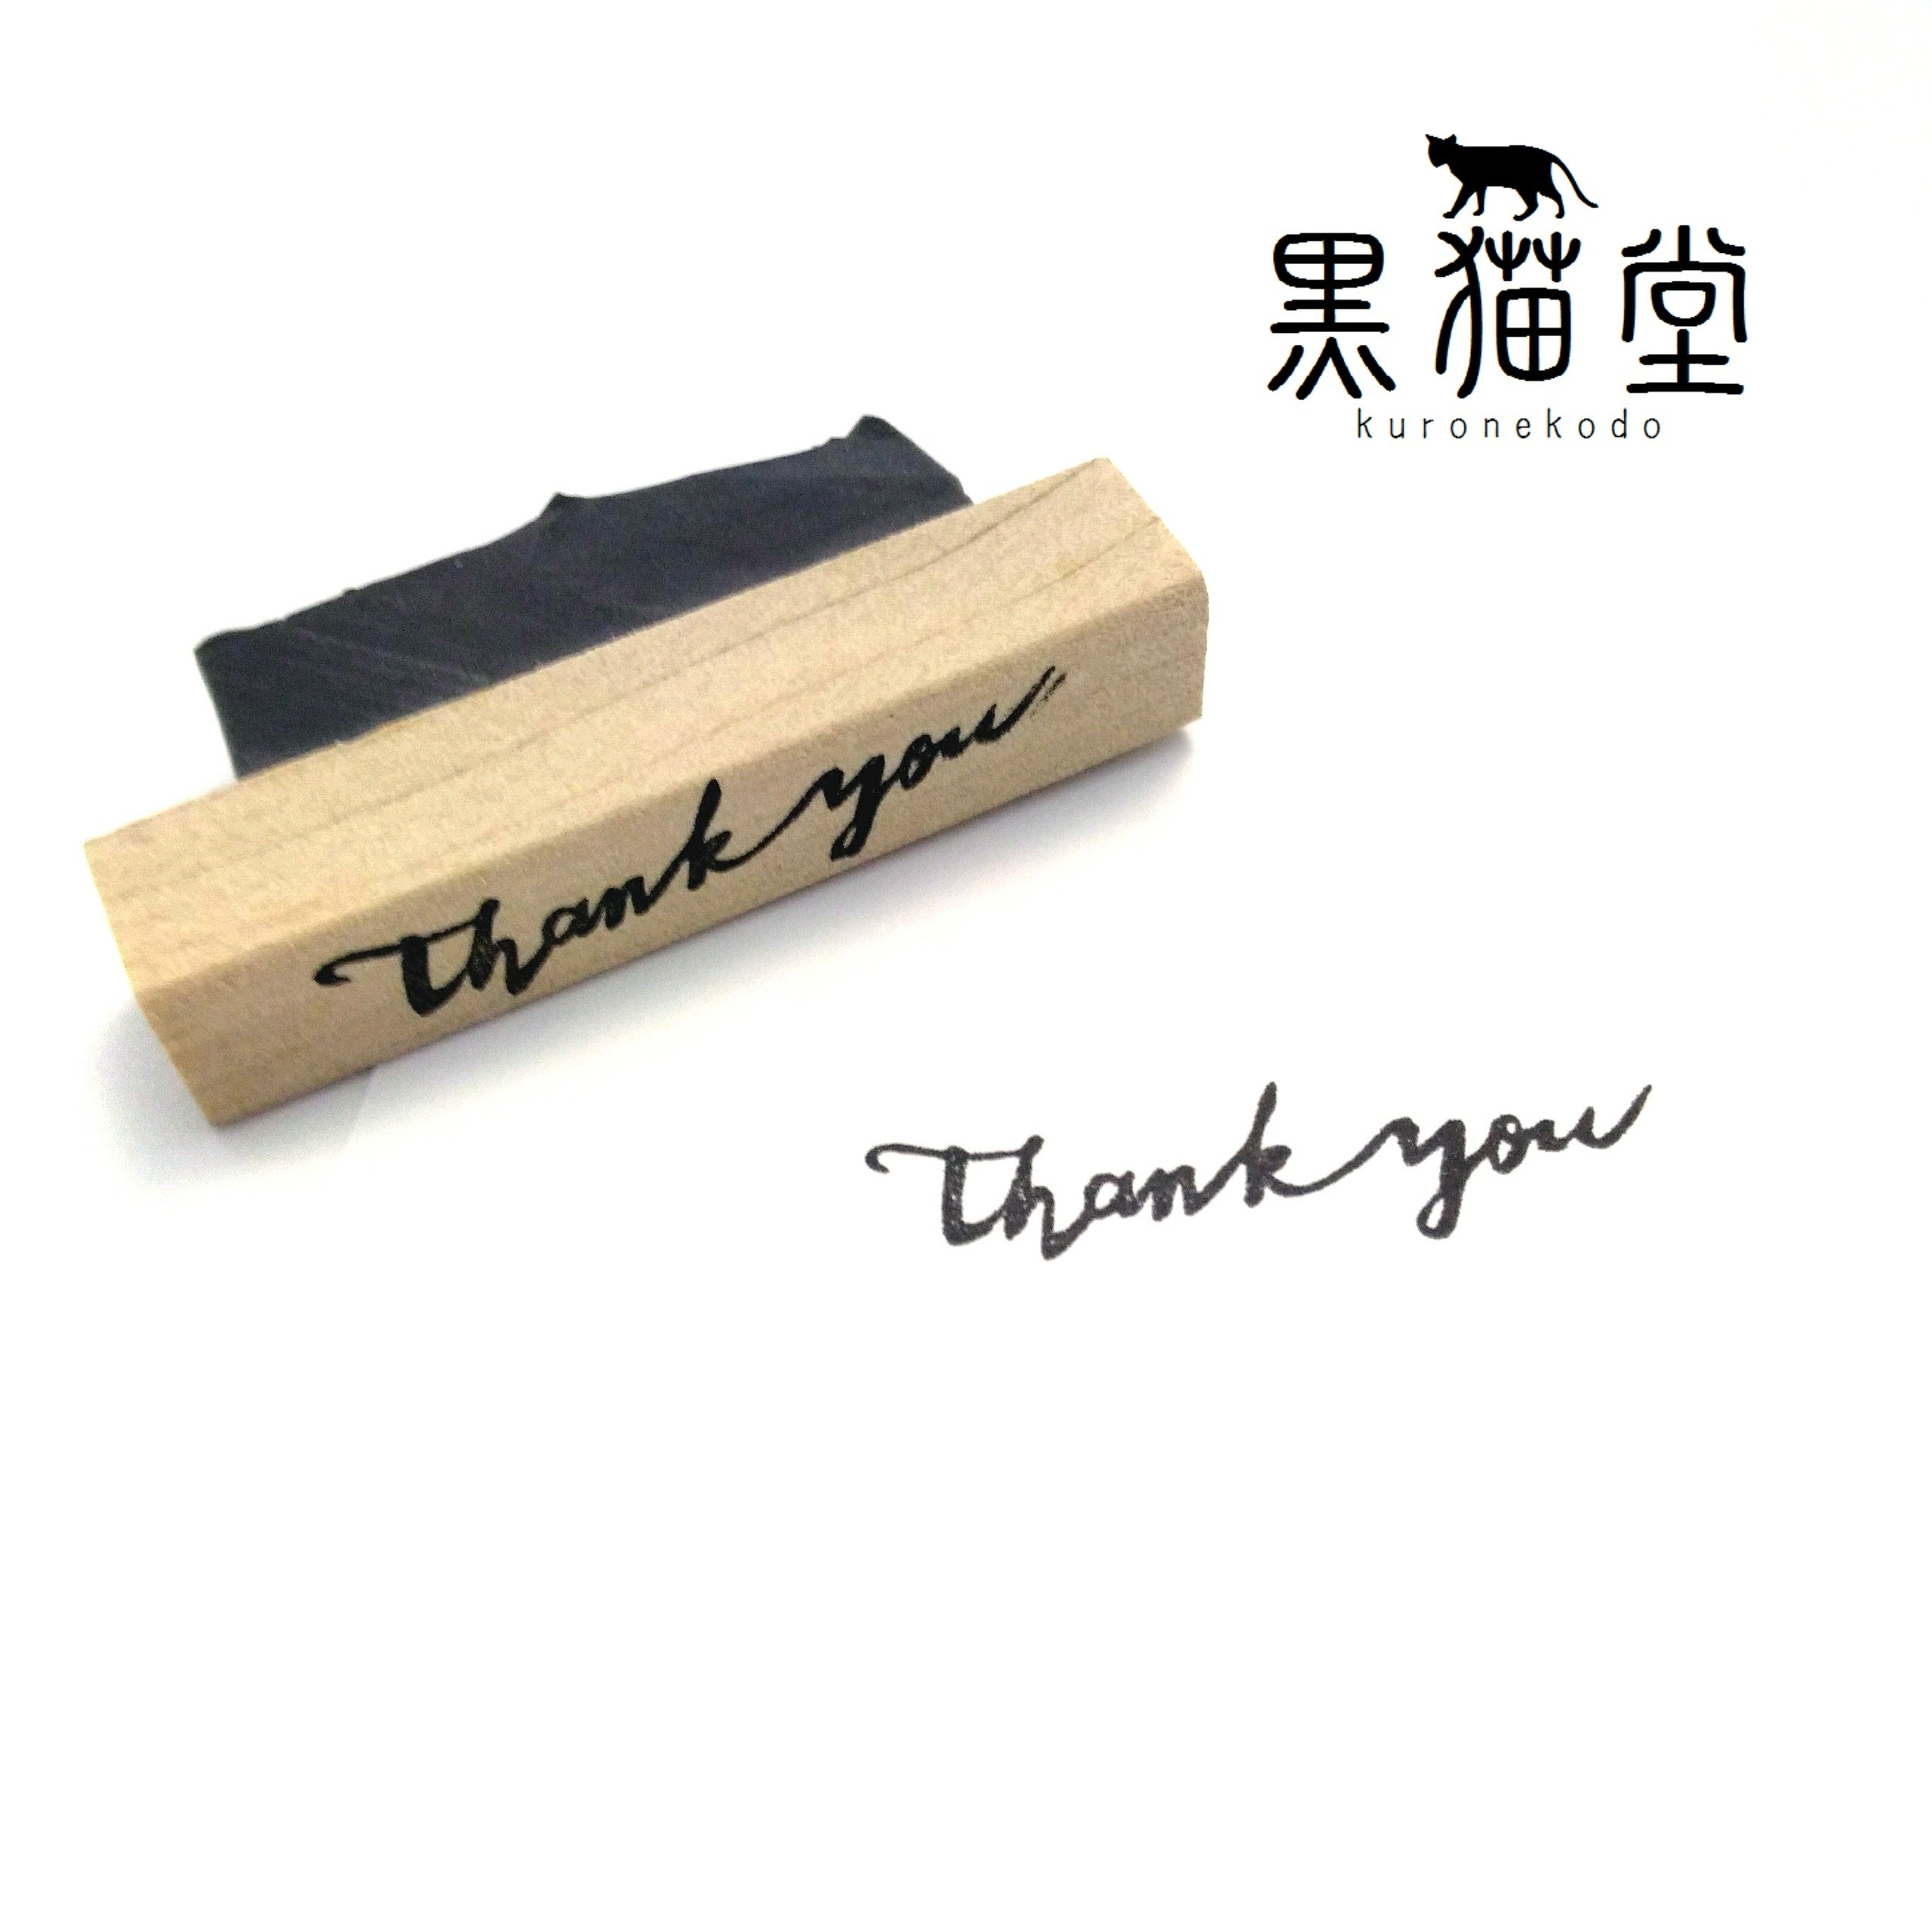 Thankyou(横)